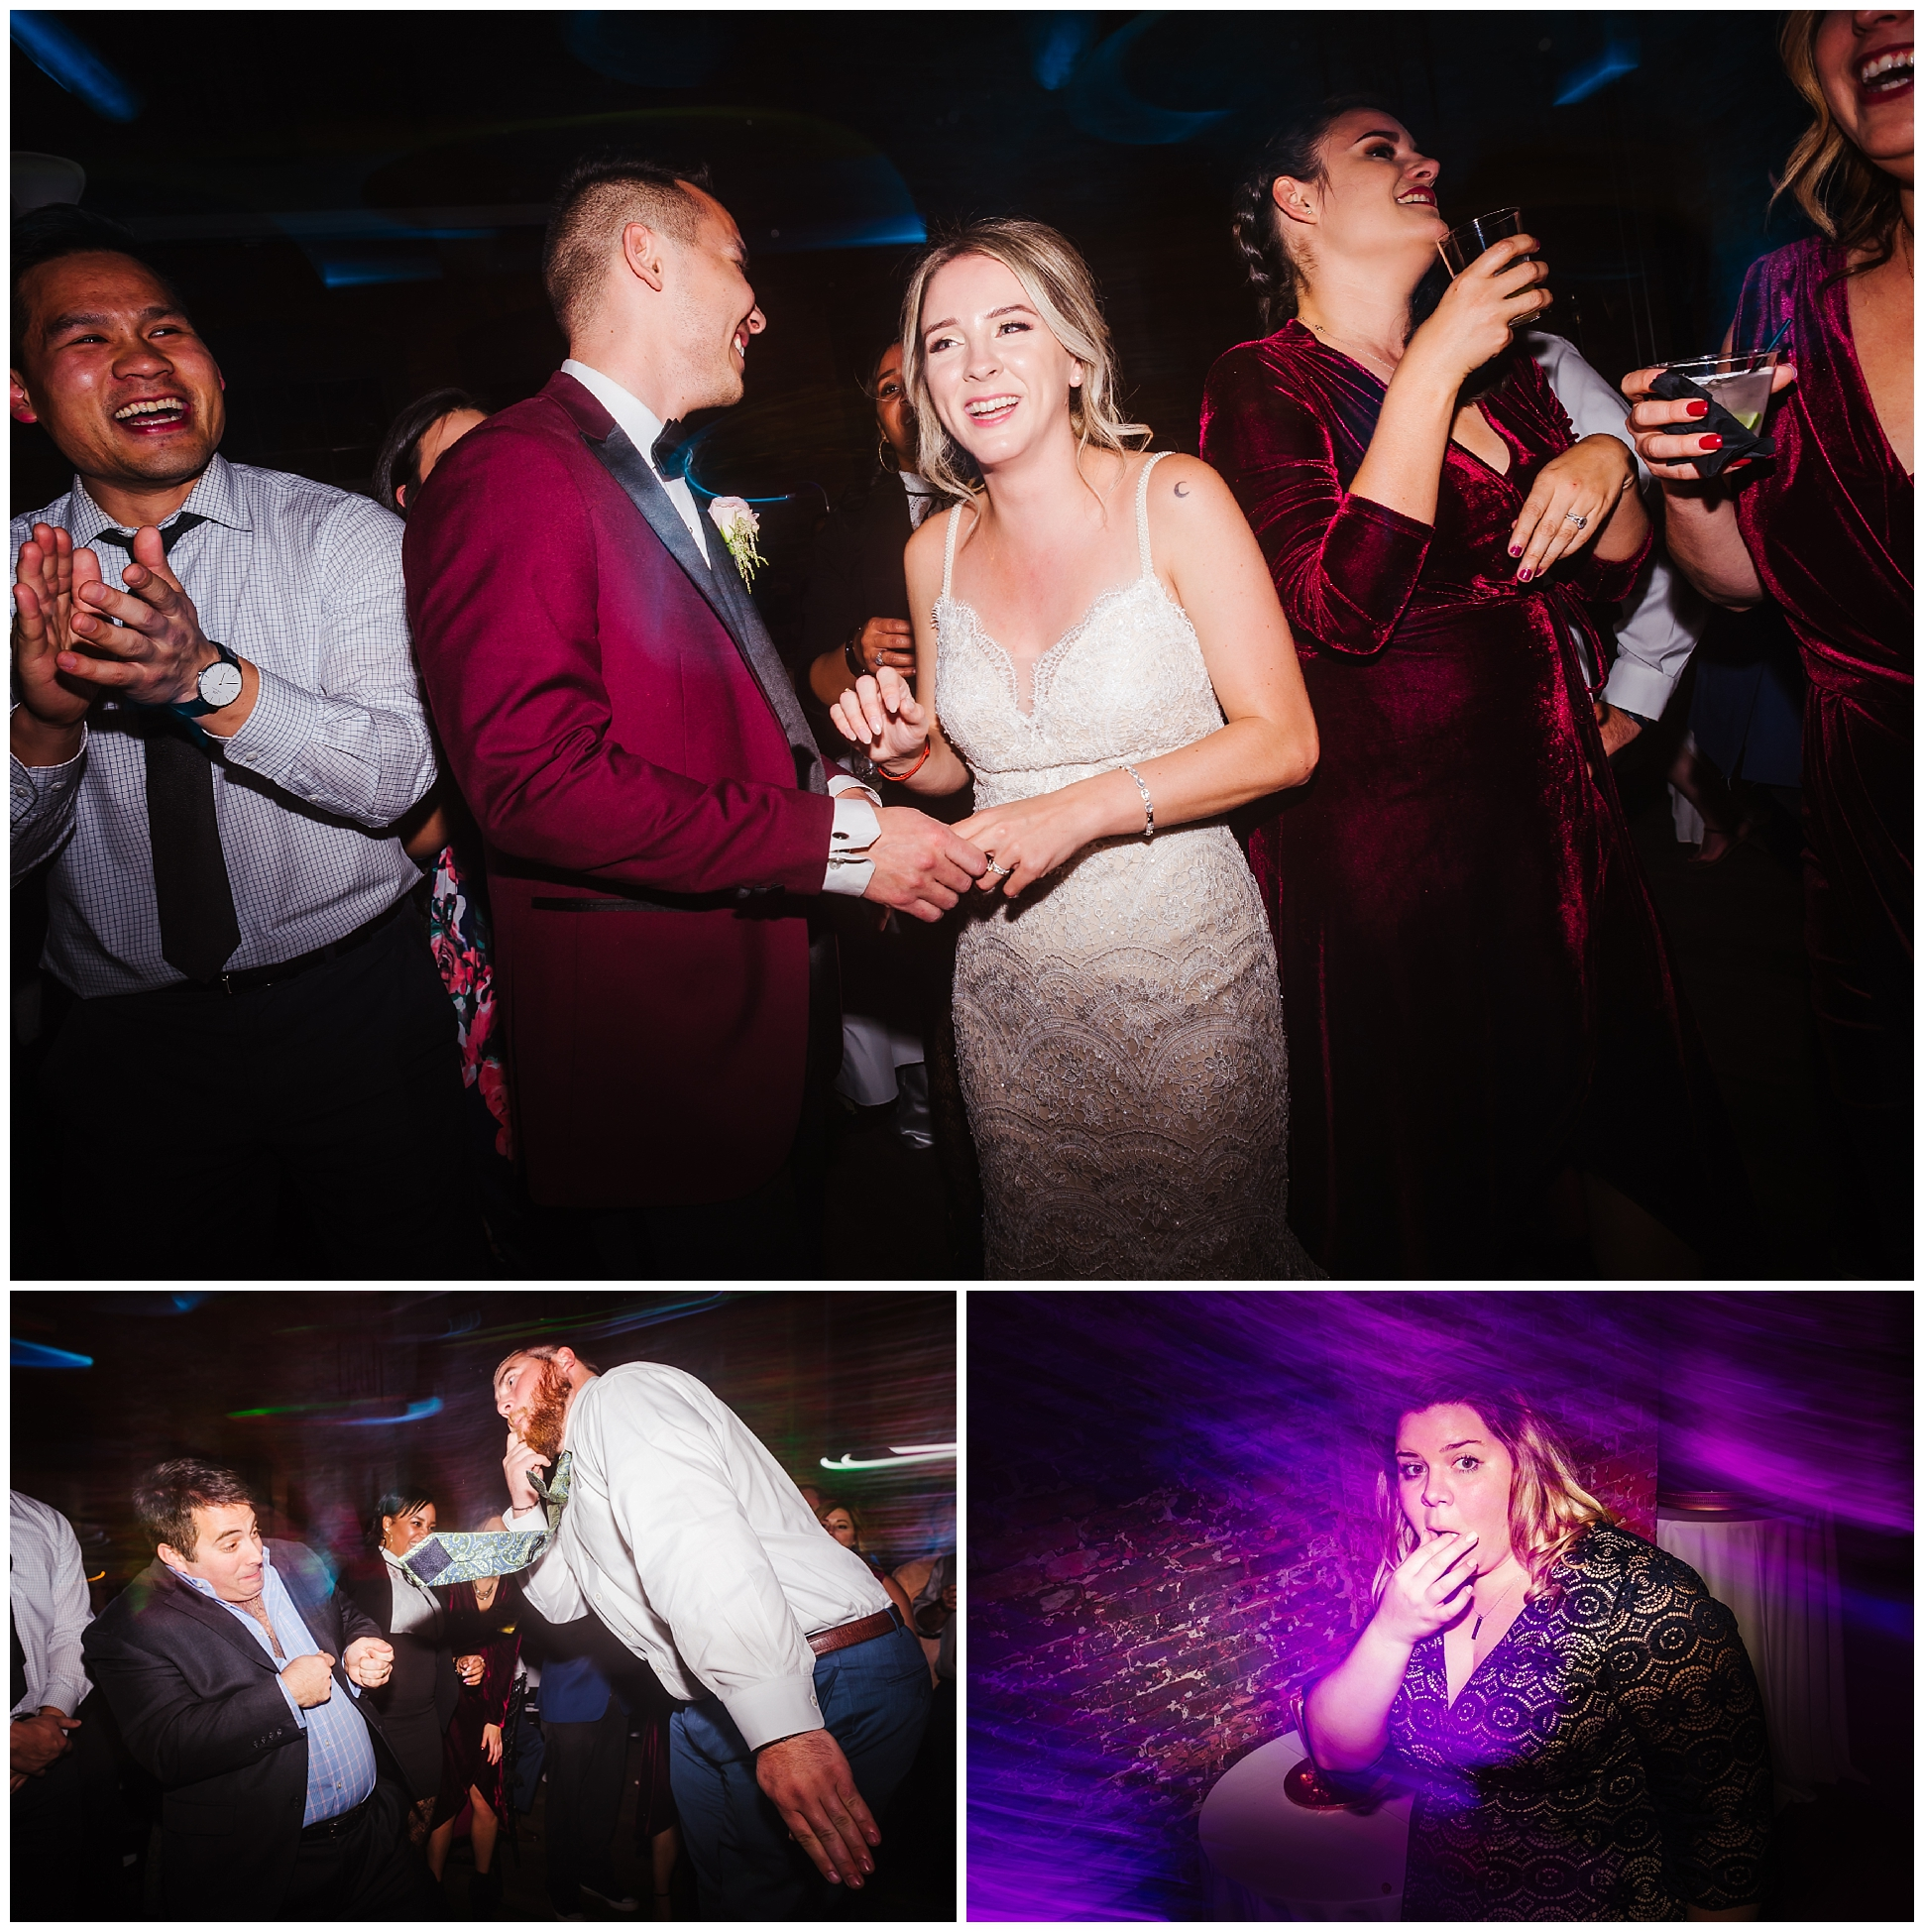 tampa-armeture-wedding-photographer-edgy-industrial-downtown-fancy-free-nursery-tattoo-burgandy-velvet_0088.jpg